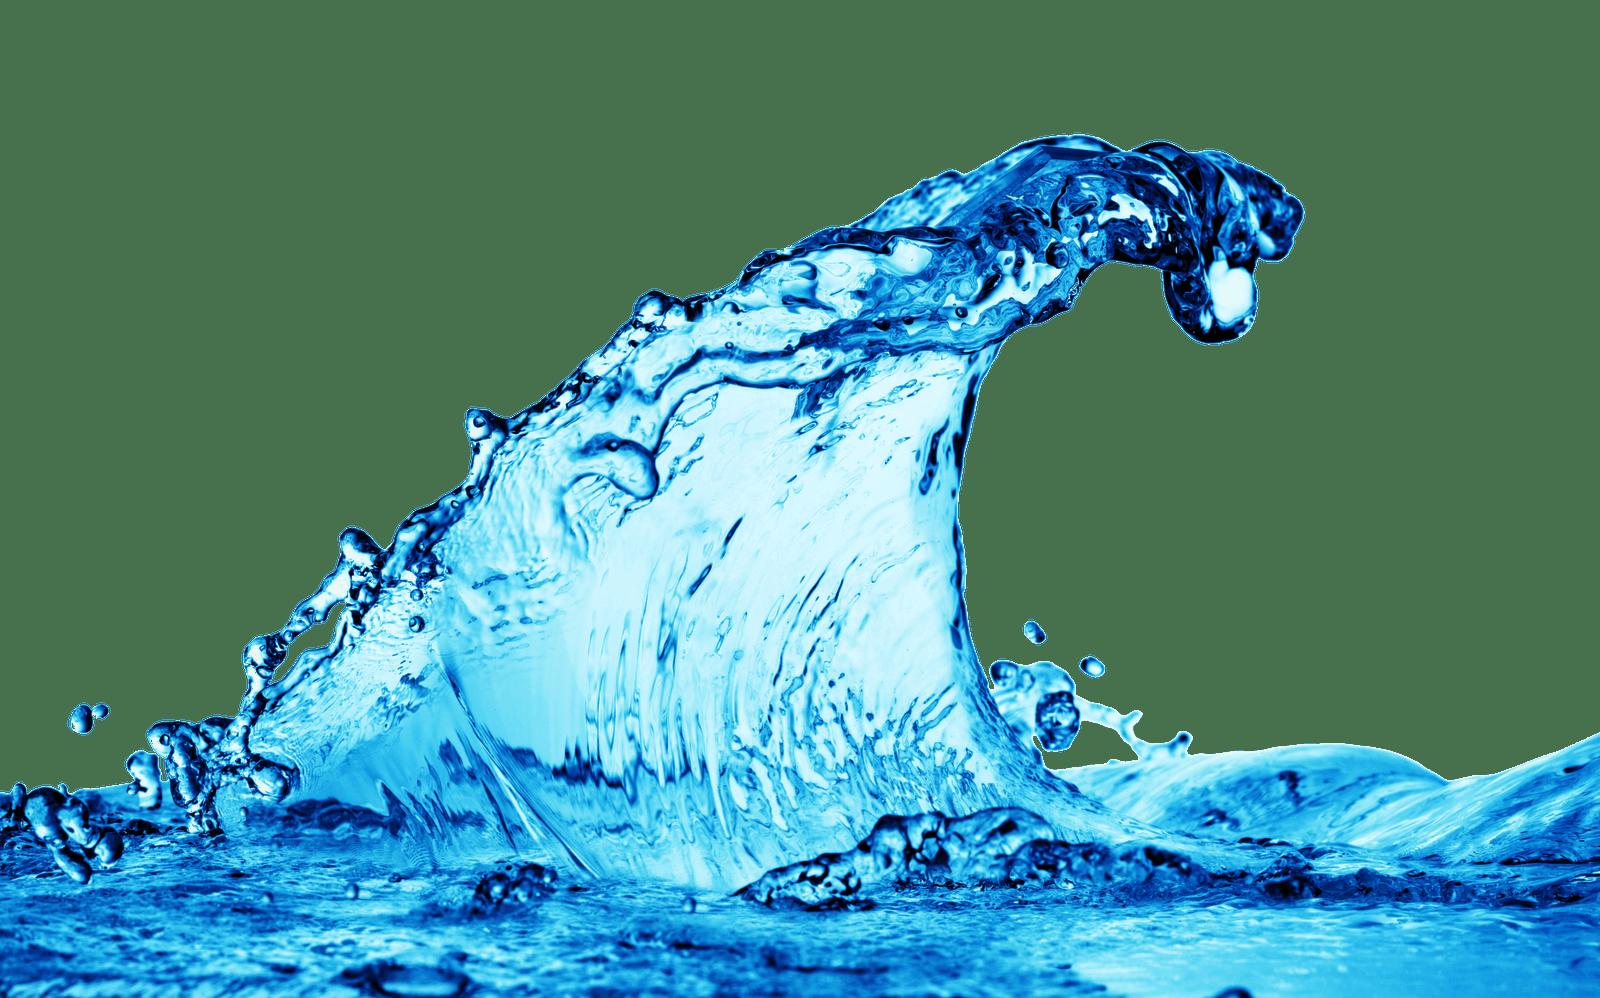 Waves clipart ocean wave. Photo transparent png stickpng